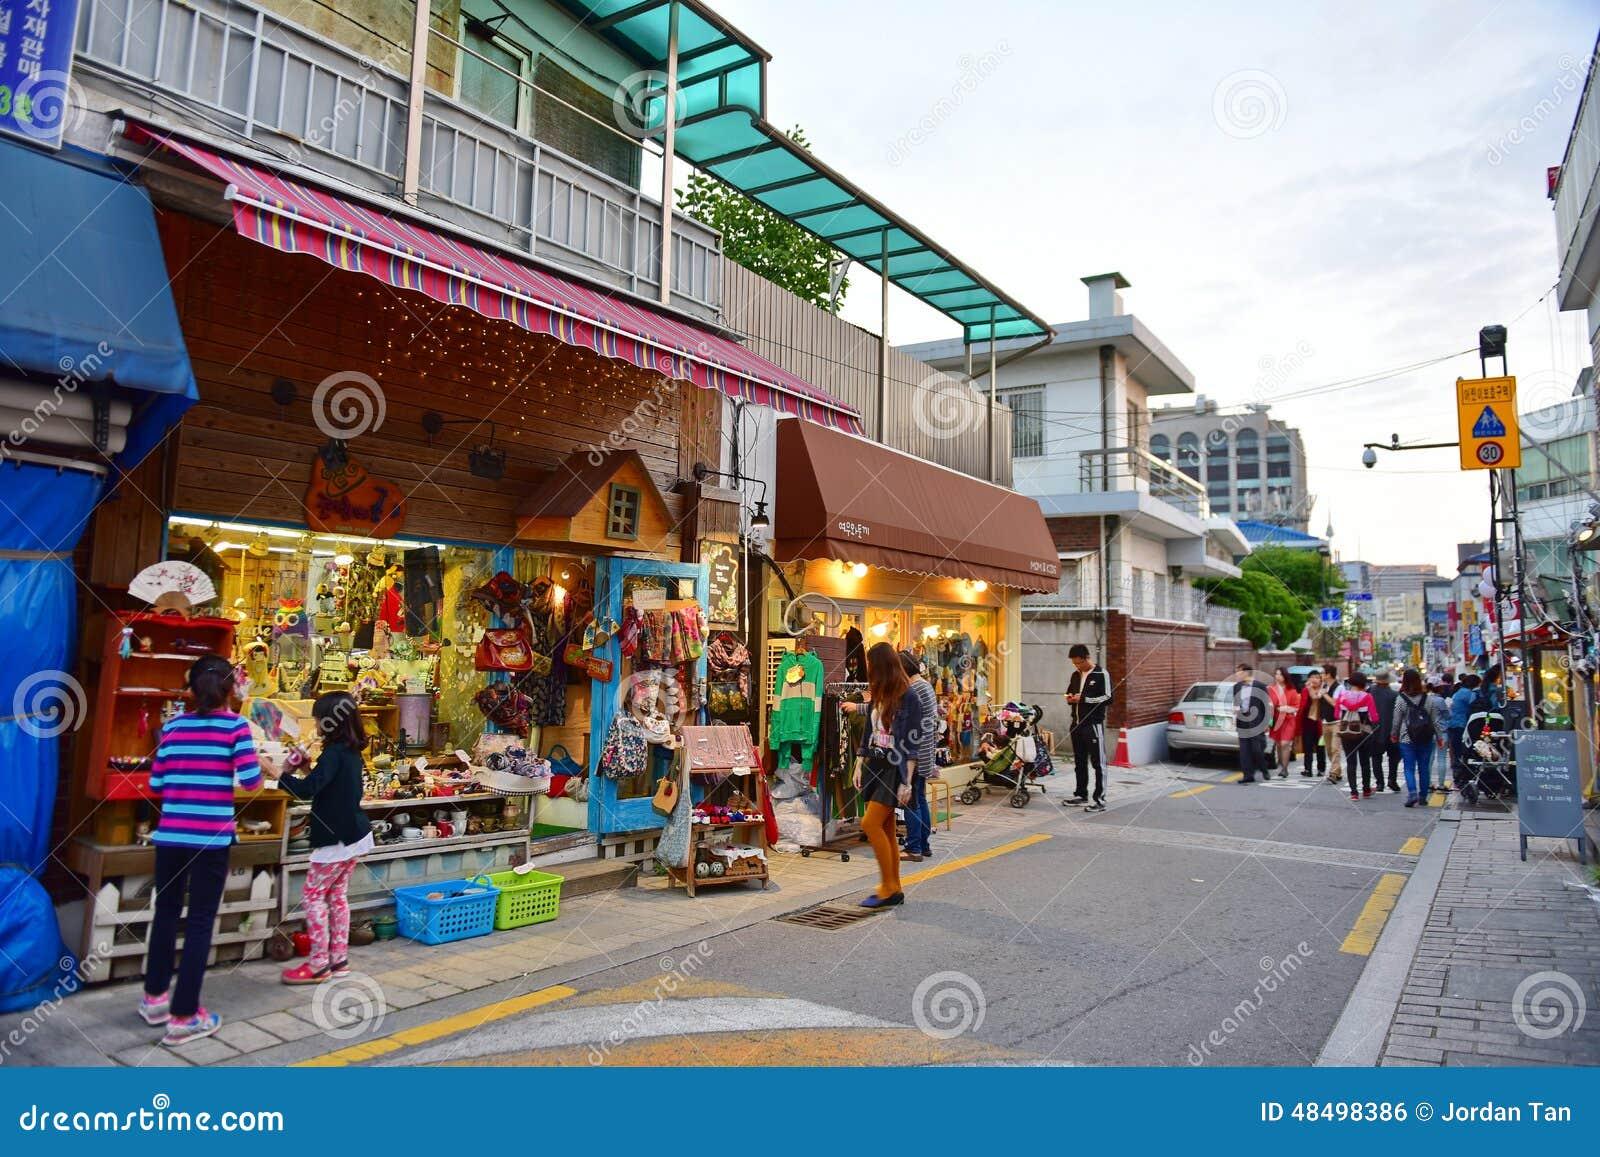 SEOUL - OCTOBER 5  Shops and restaurants at Bukchon Hanok Village a08f3f06e02ba